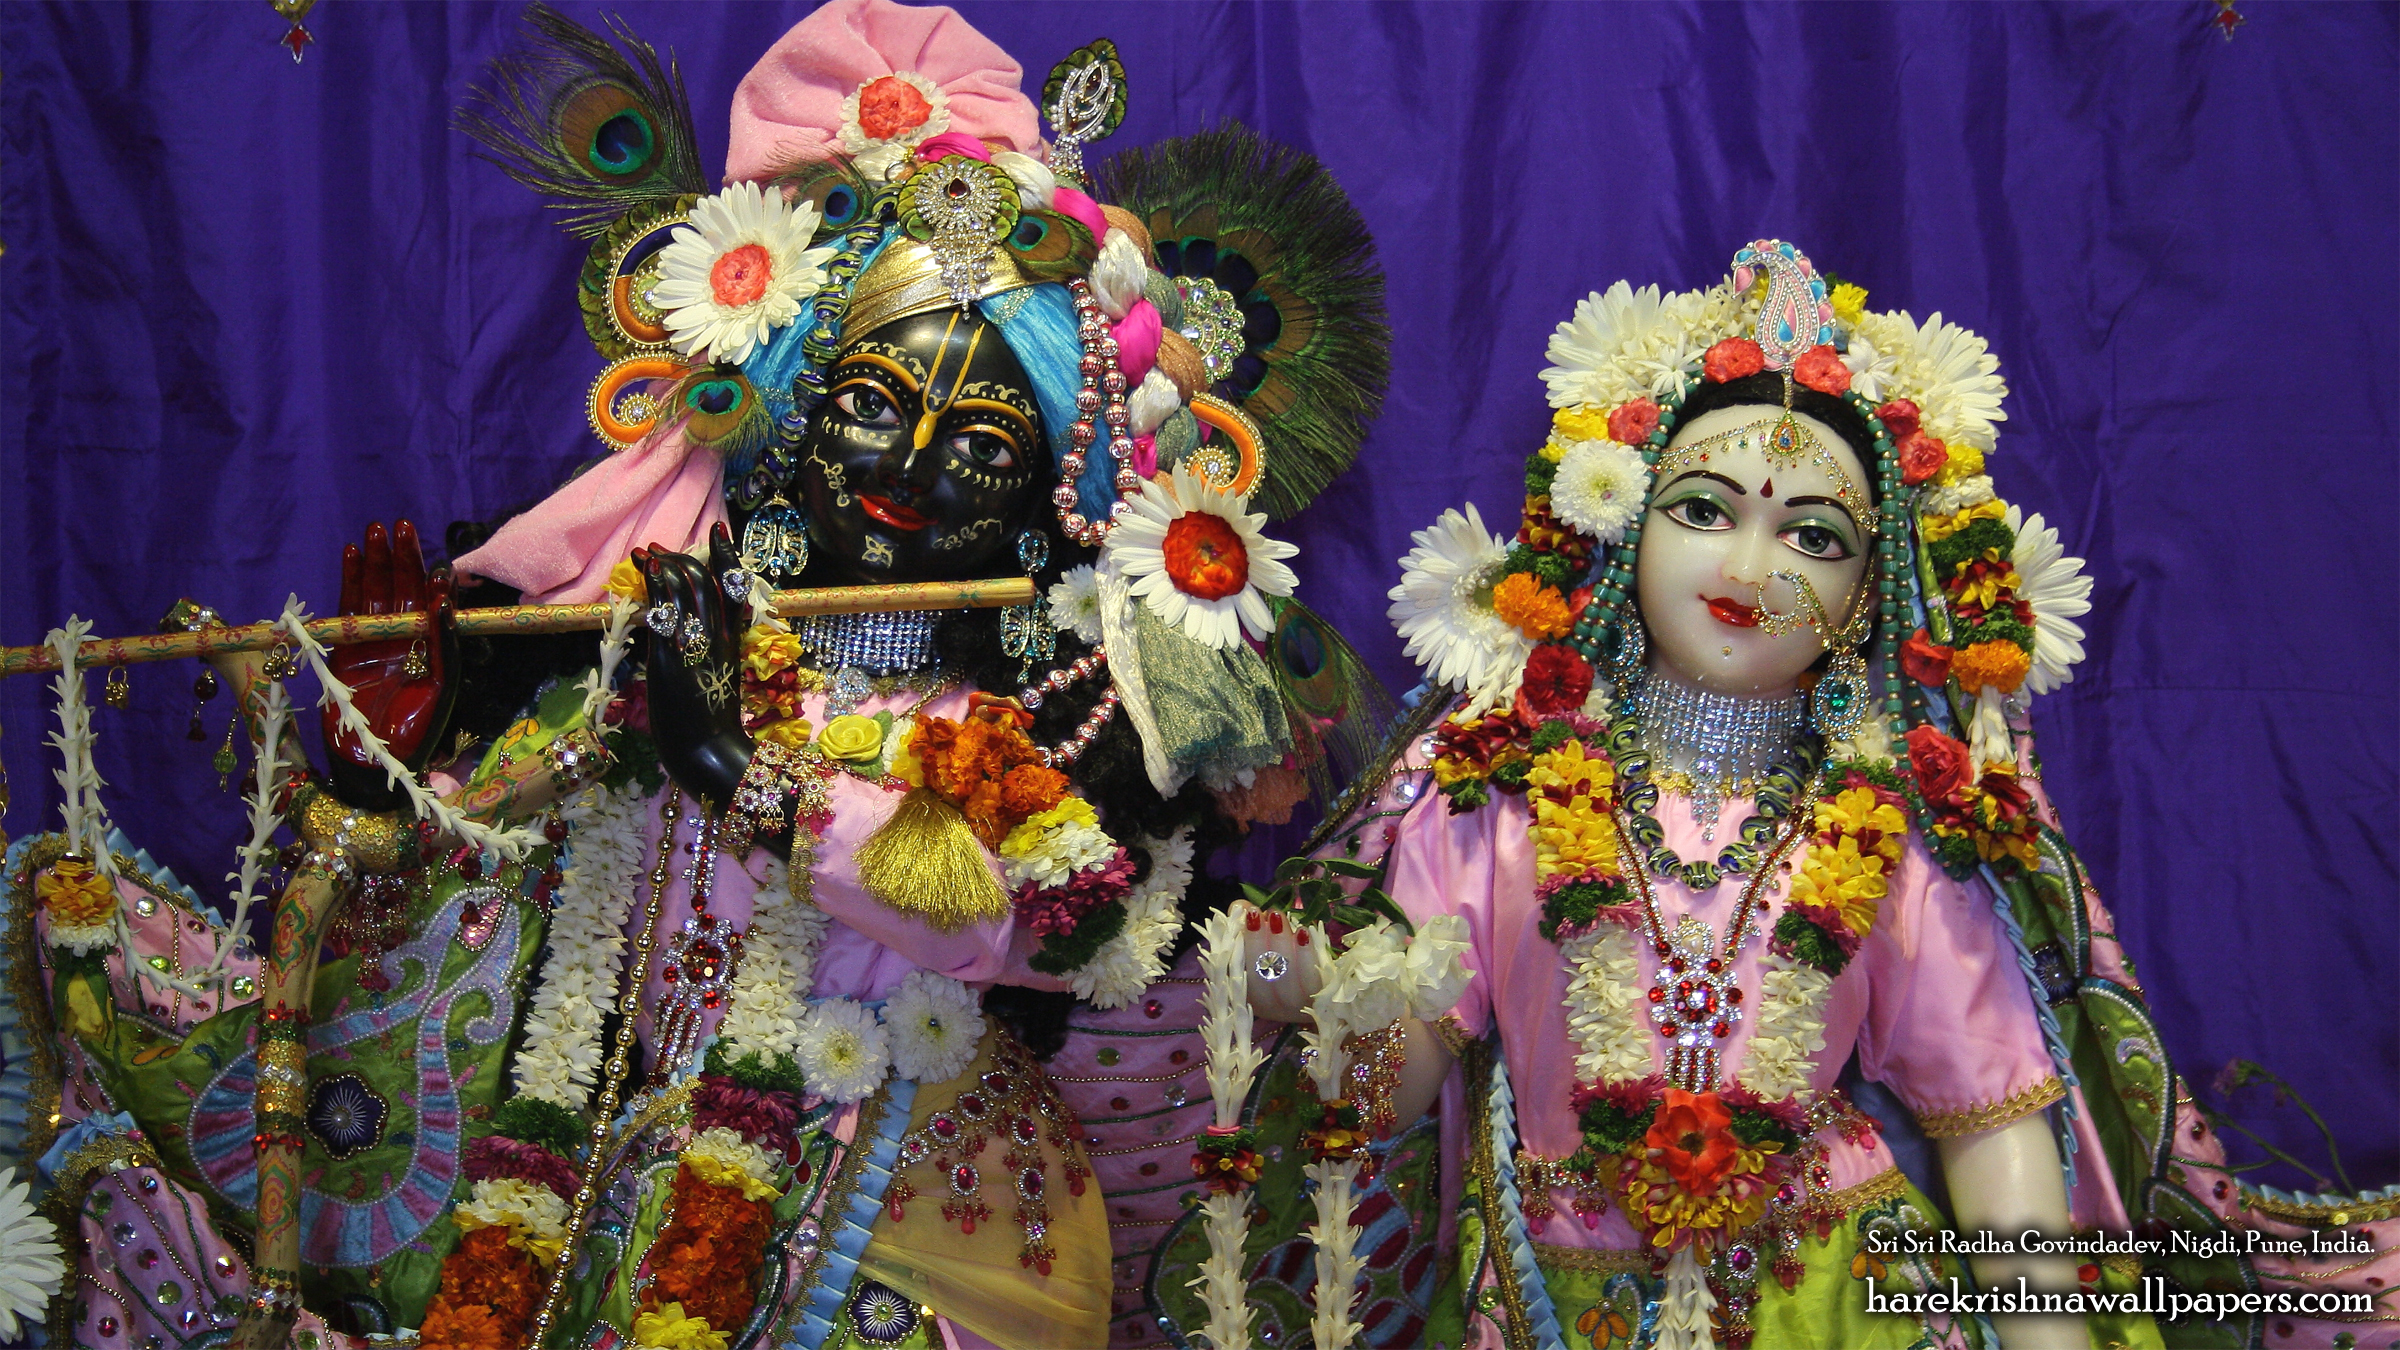 Sri Sri Radha Govind Close up Wallpaper (012) Size 2400x1350 Download